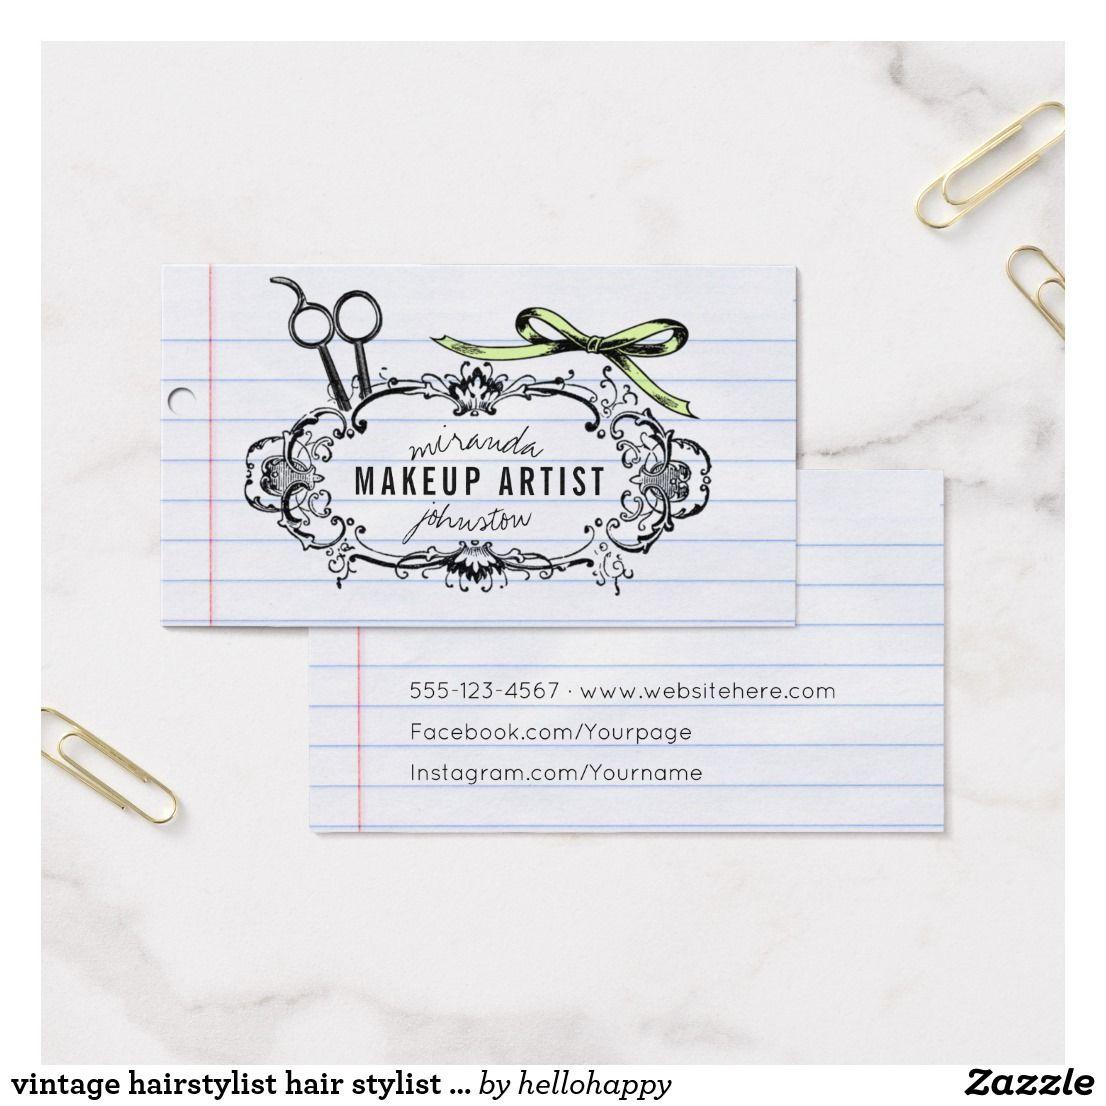 Vintage hairstylist hair stylist calligraphy bow business card vintage hairstylist hair stylist calligraphy bow business card colourmoves